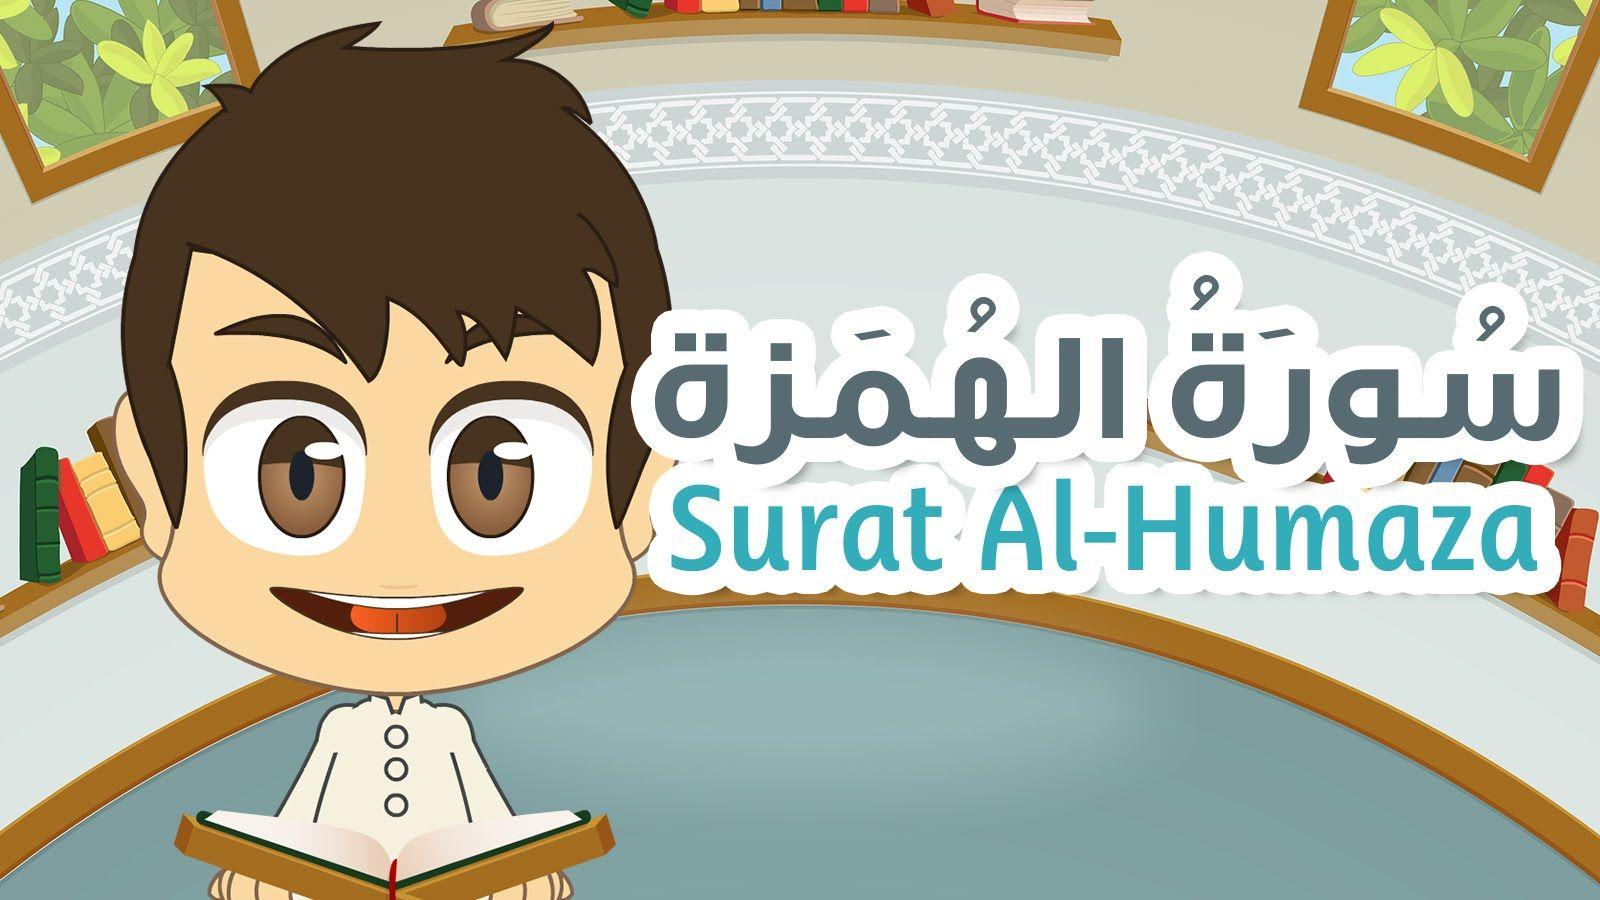 Quran For Kids Surah Al Humaza 104 القرآن للأطفال سورة الهمزة Learn Quran Kids Learning Learn Arabic Online